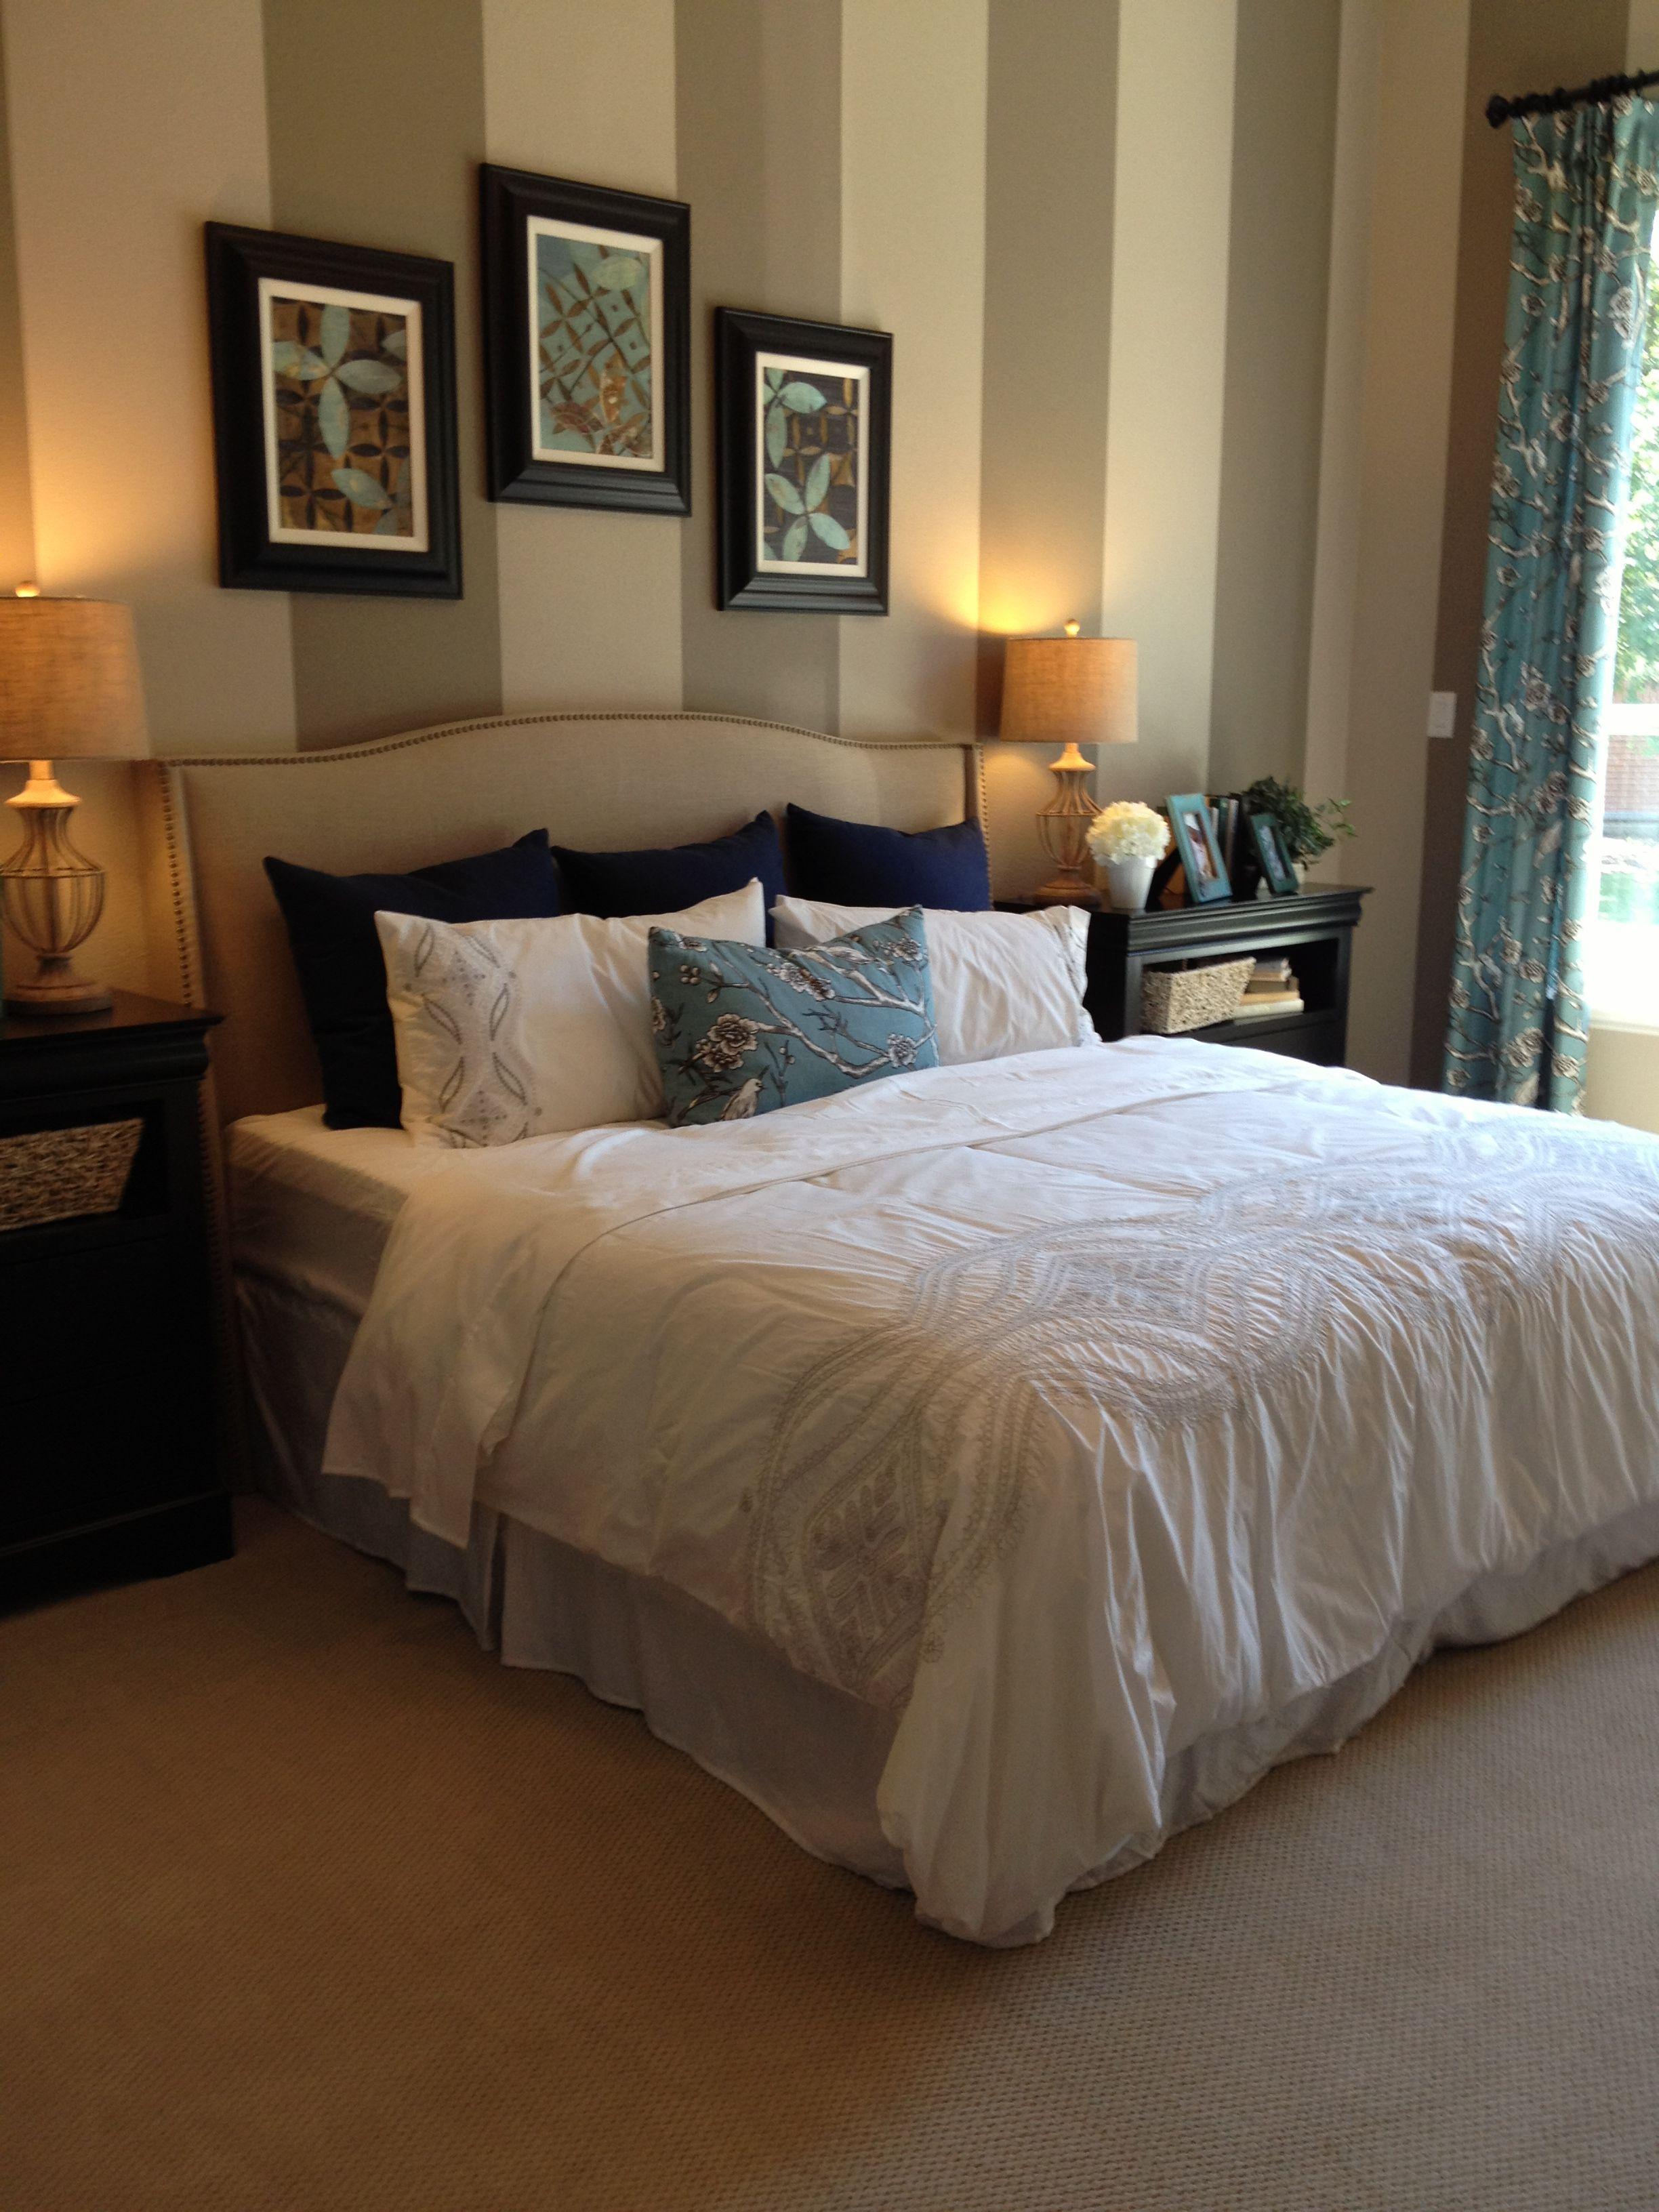 Einrichtungsideen für wohnkultur bedroom decor idea  u  ubedroom ideas  pinterest  dekoration